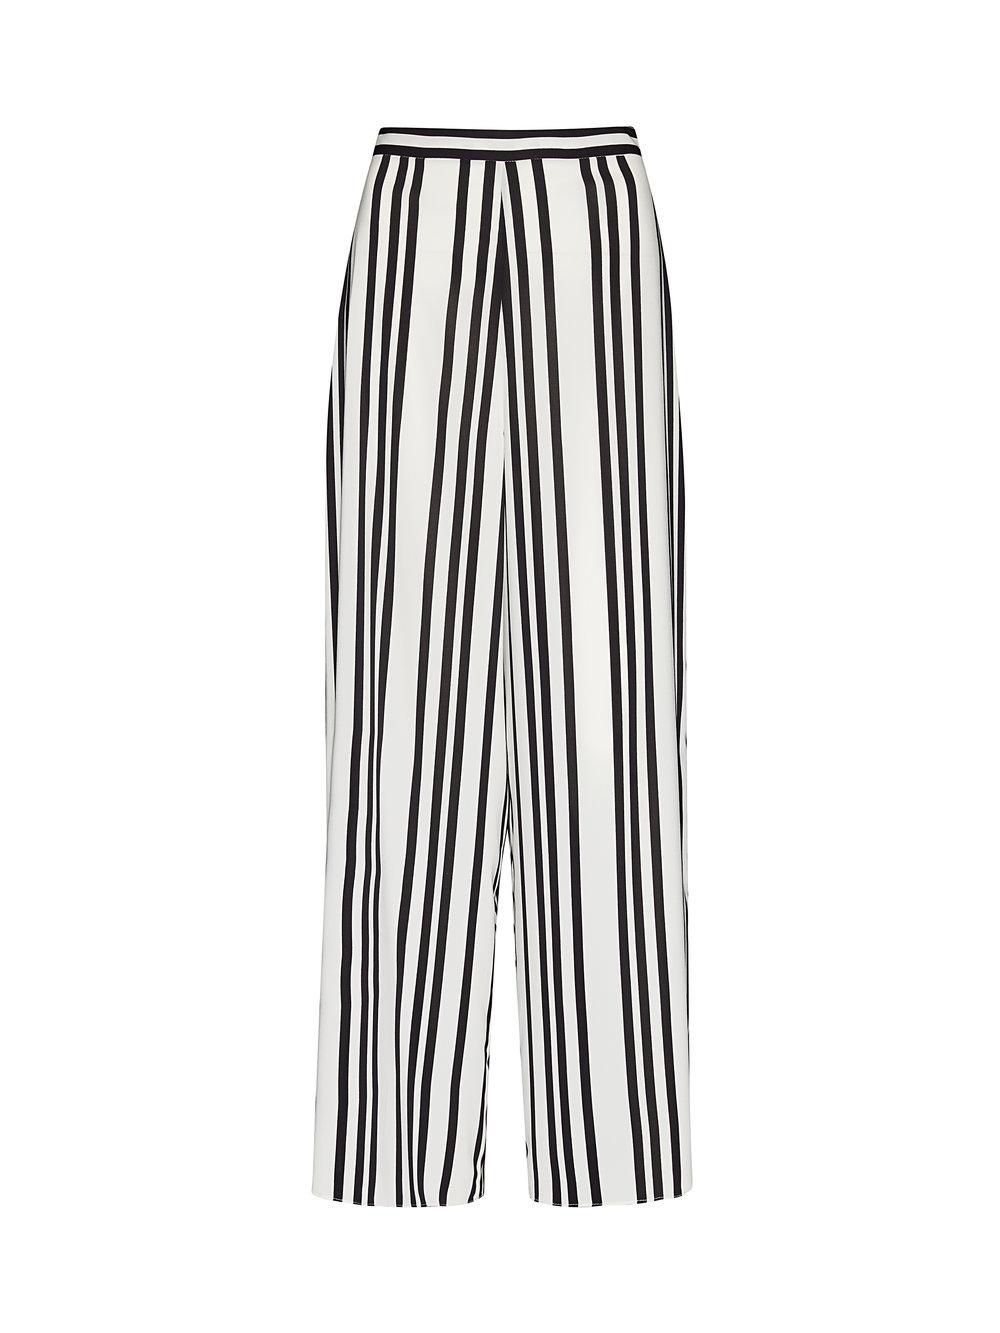 Alice + Olivia Sherice Darted High Waisted Pants,$330, at AliceandOlivia.com